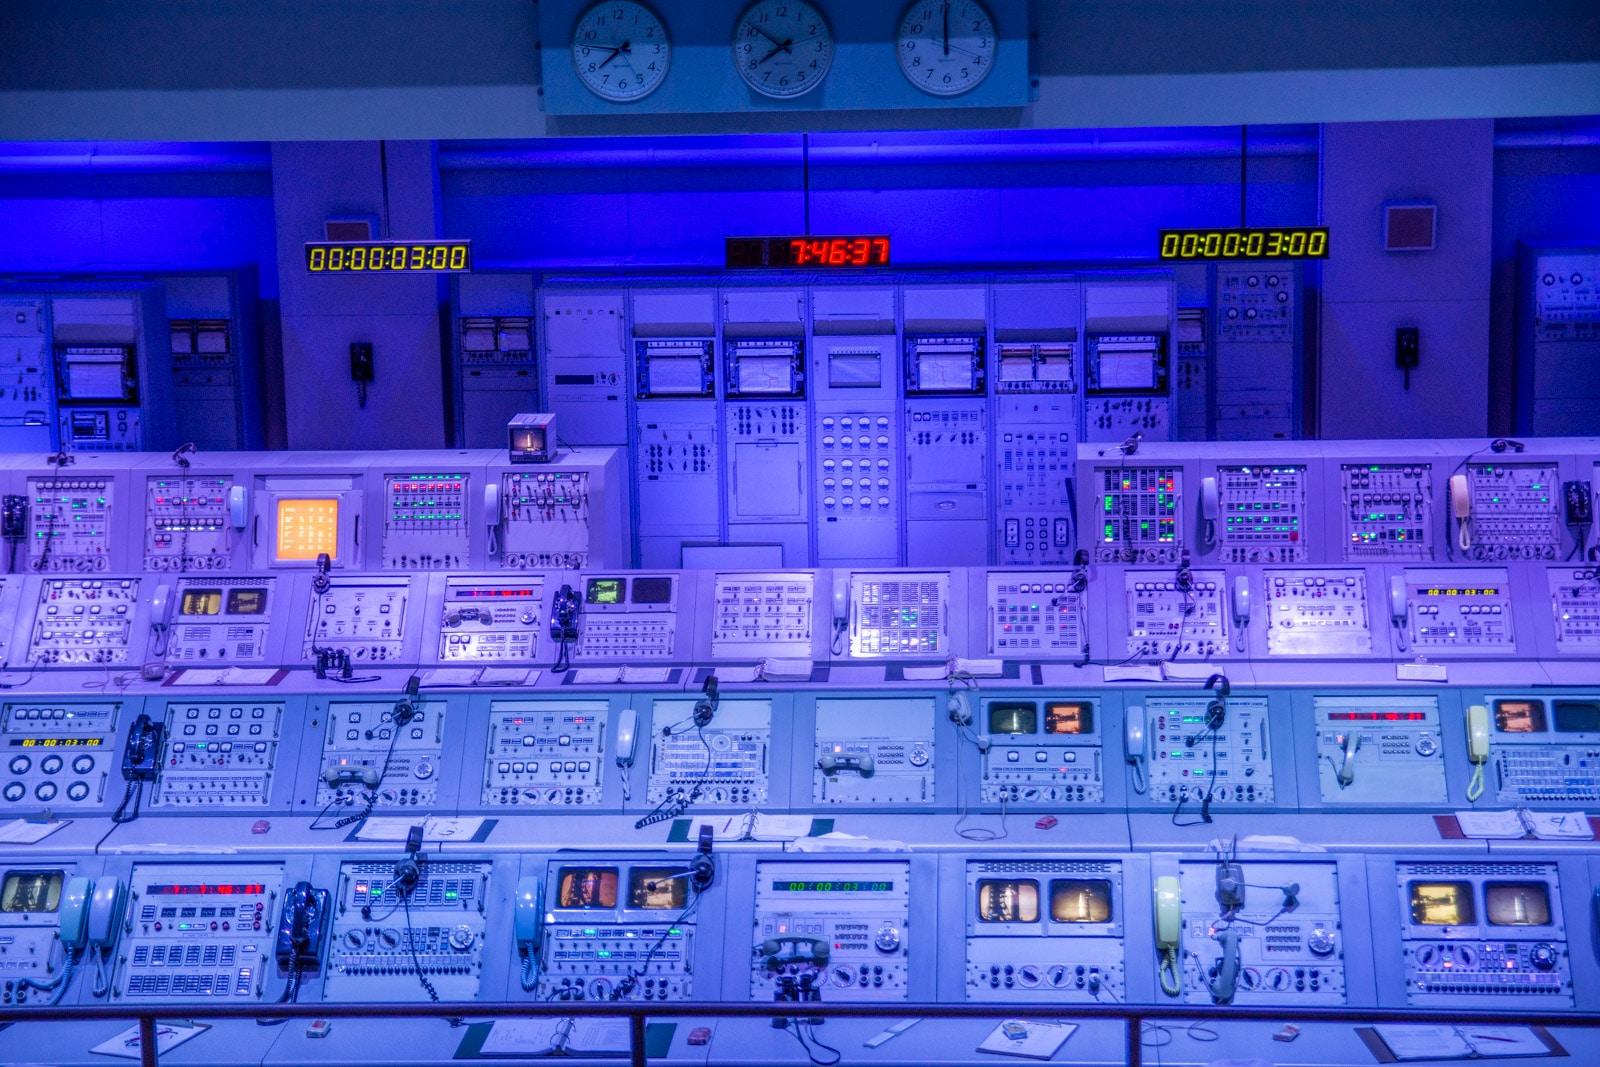 Kontrola misji Atlantis